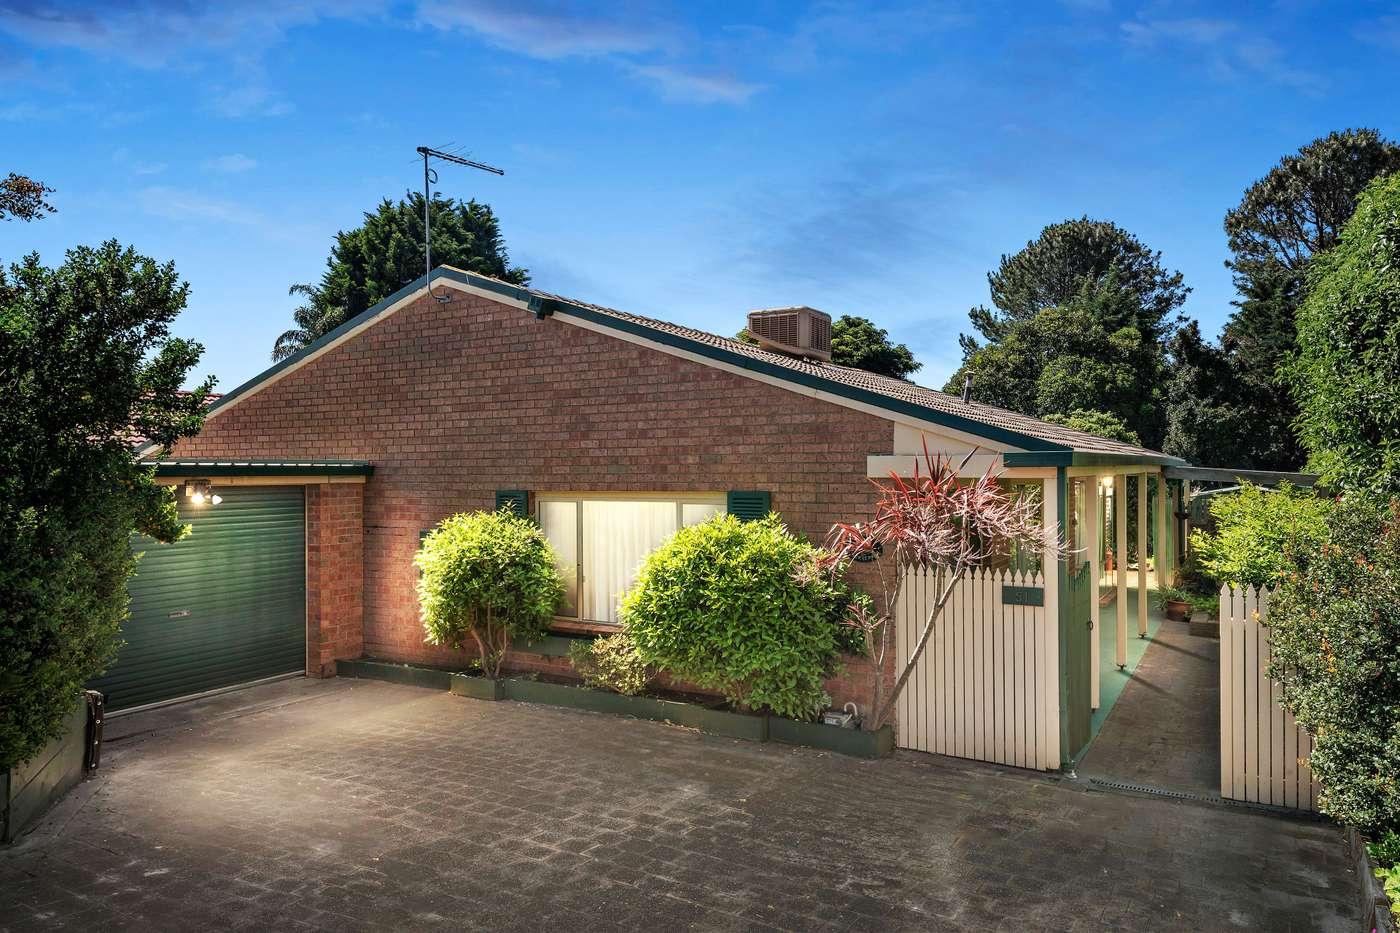 Main view of Homely house listing, 51 Aquarius Drive, Frankston, VIC 3199